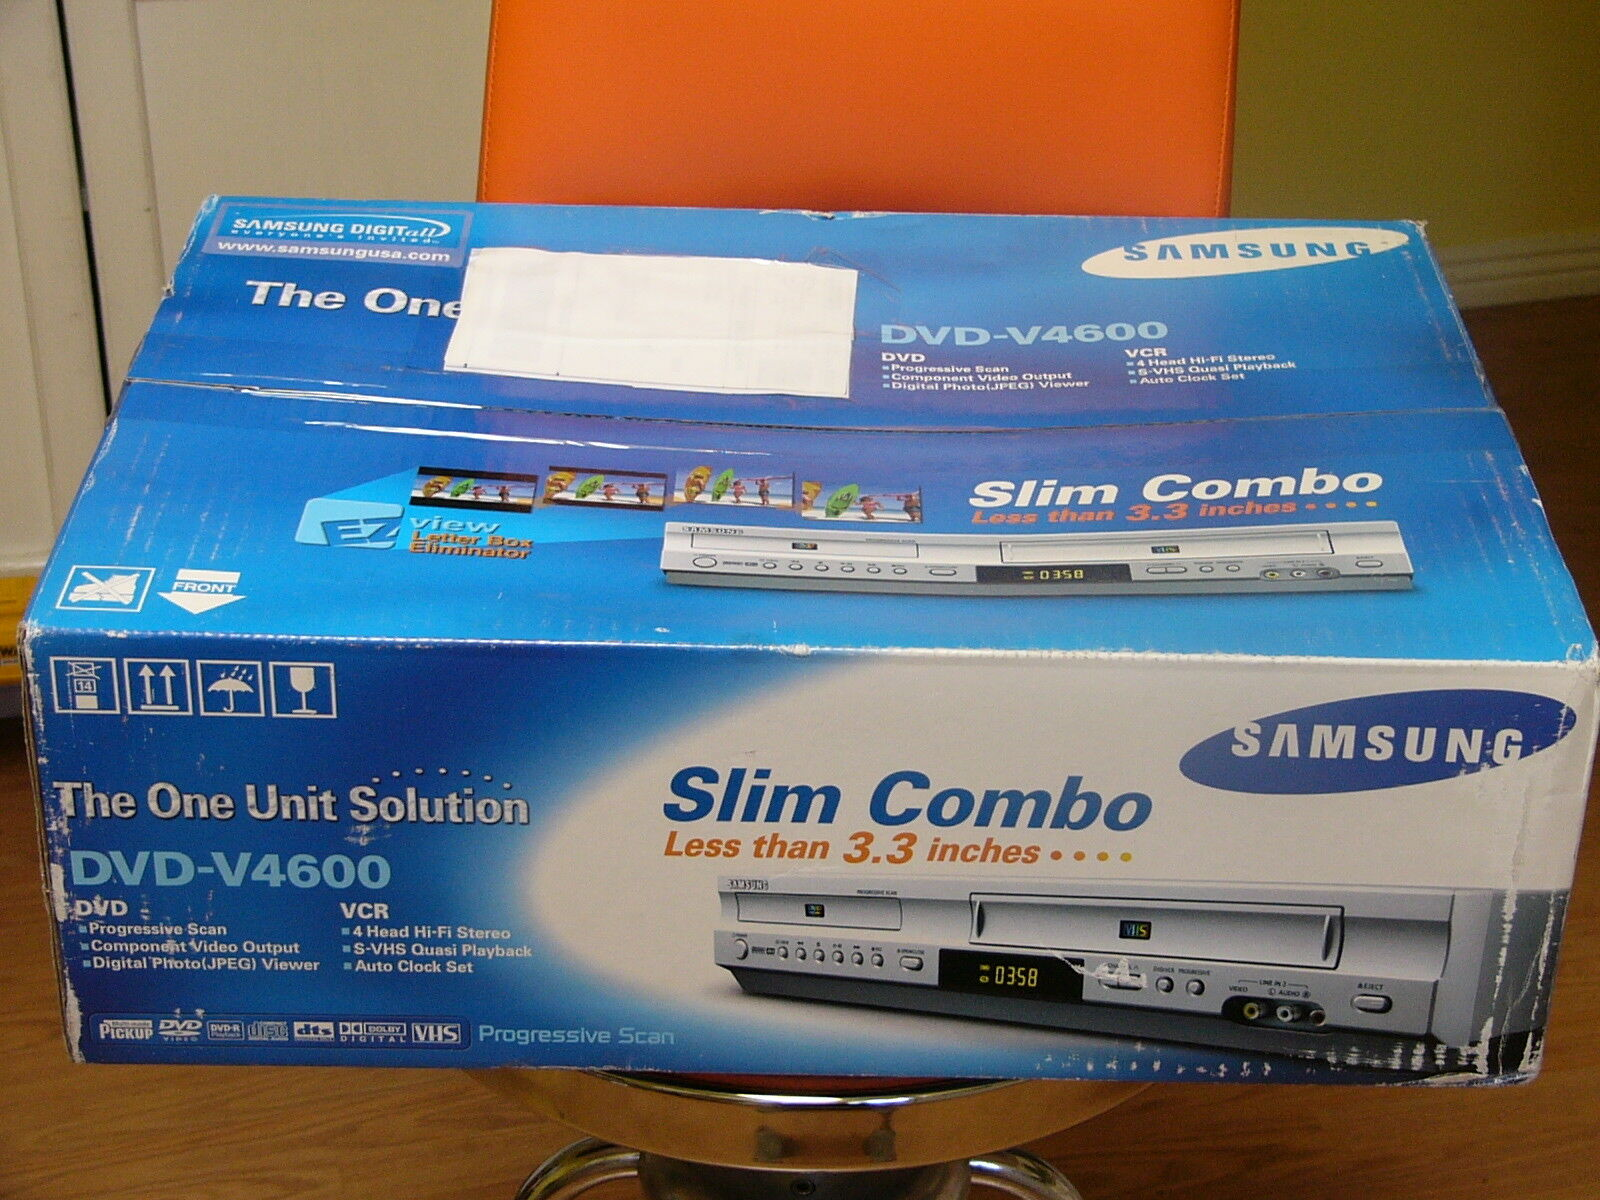 NEW Samsung DVD-V4600 DVD Player VCR Combo 4 Head Hi Fi Ster